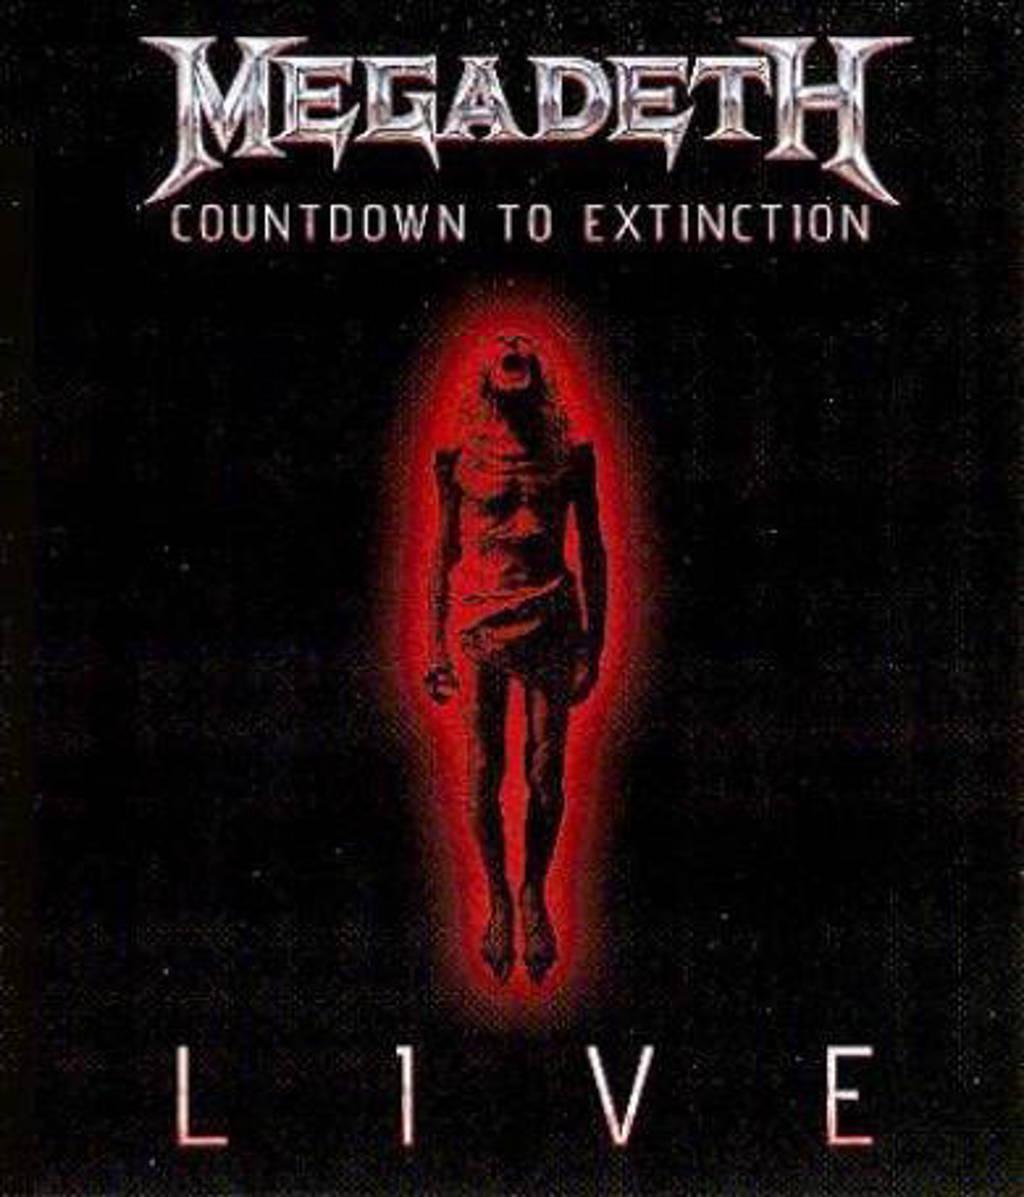 Megadeth - Countdown To Extinction: Live (Blu-ray)